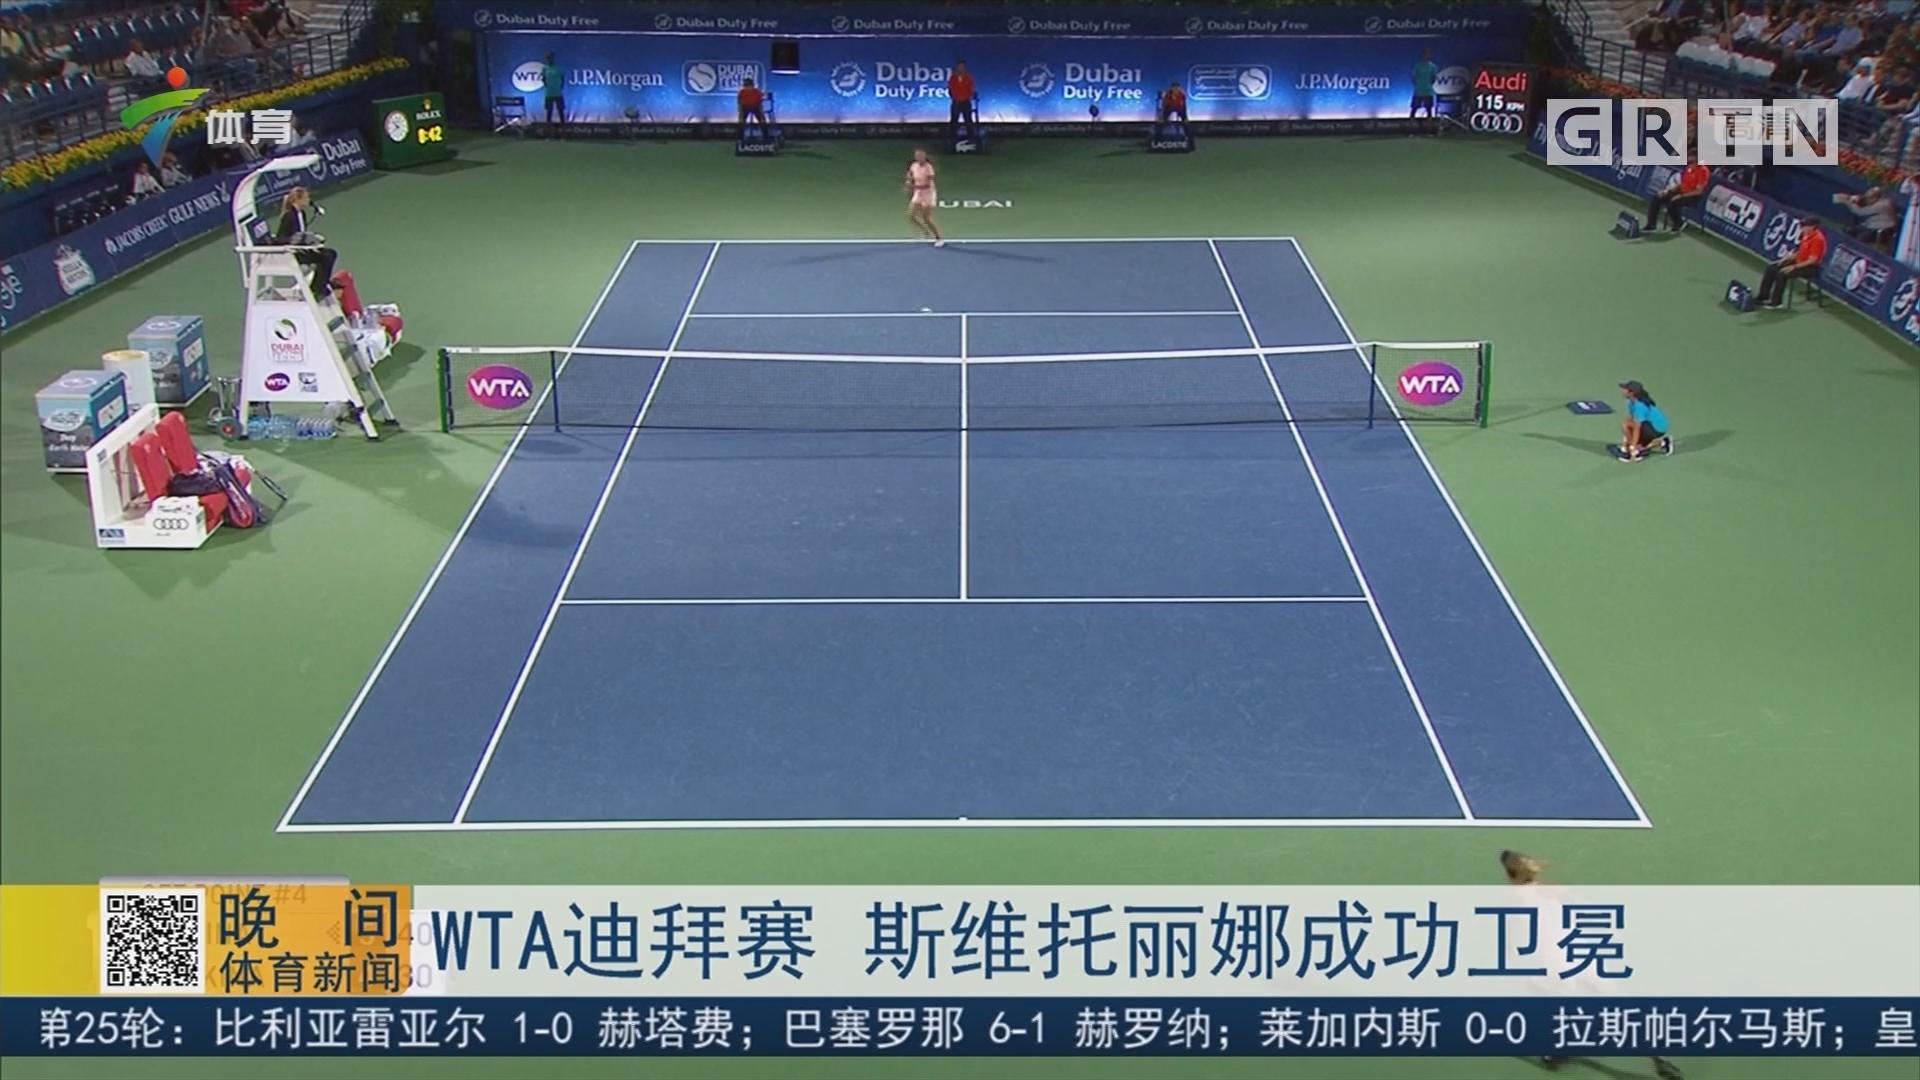 WTA迪拜赛 斯维托丽娜成功卫冕